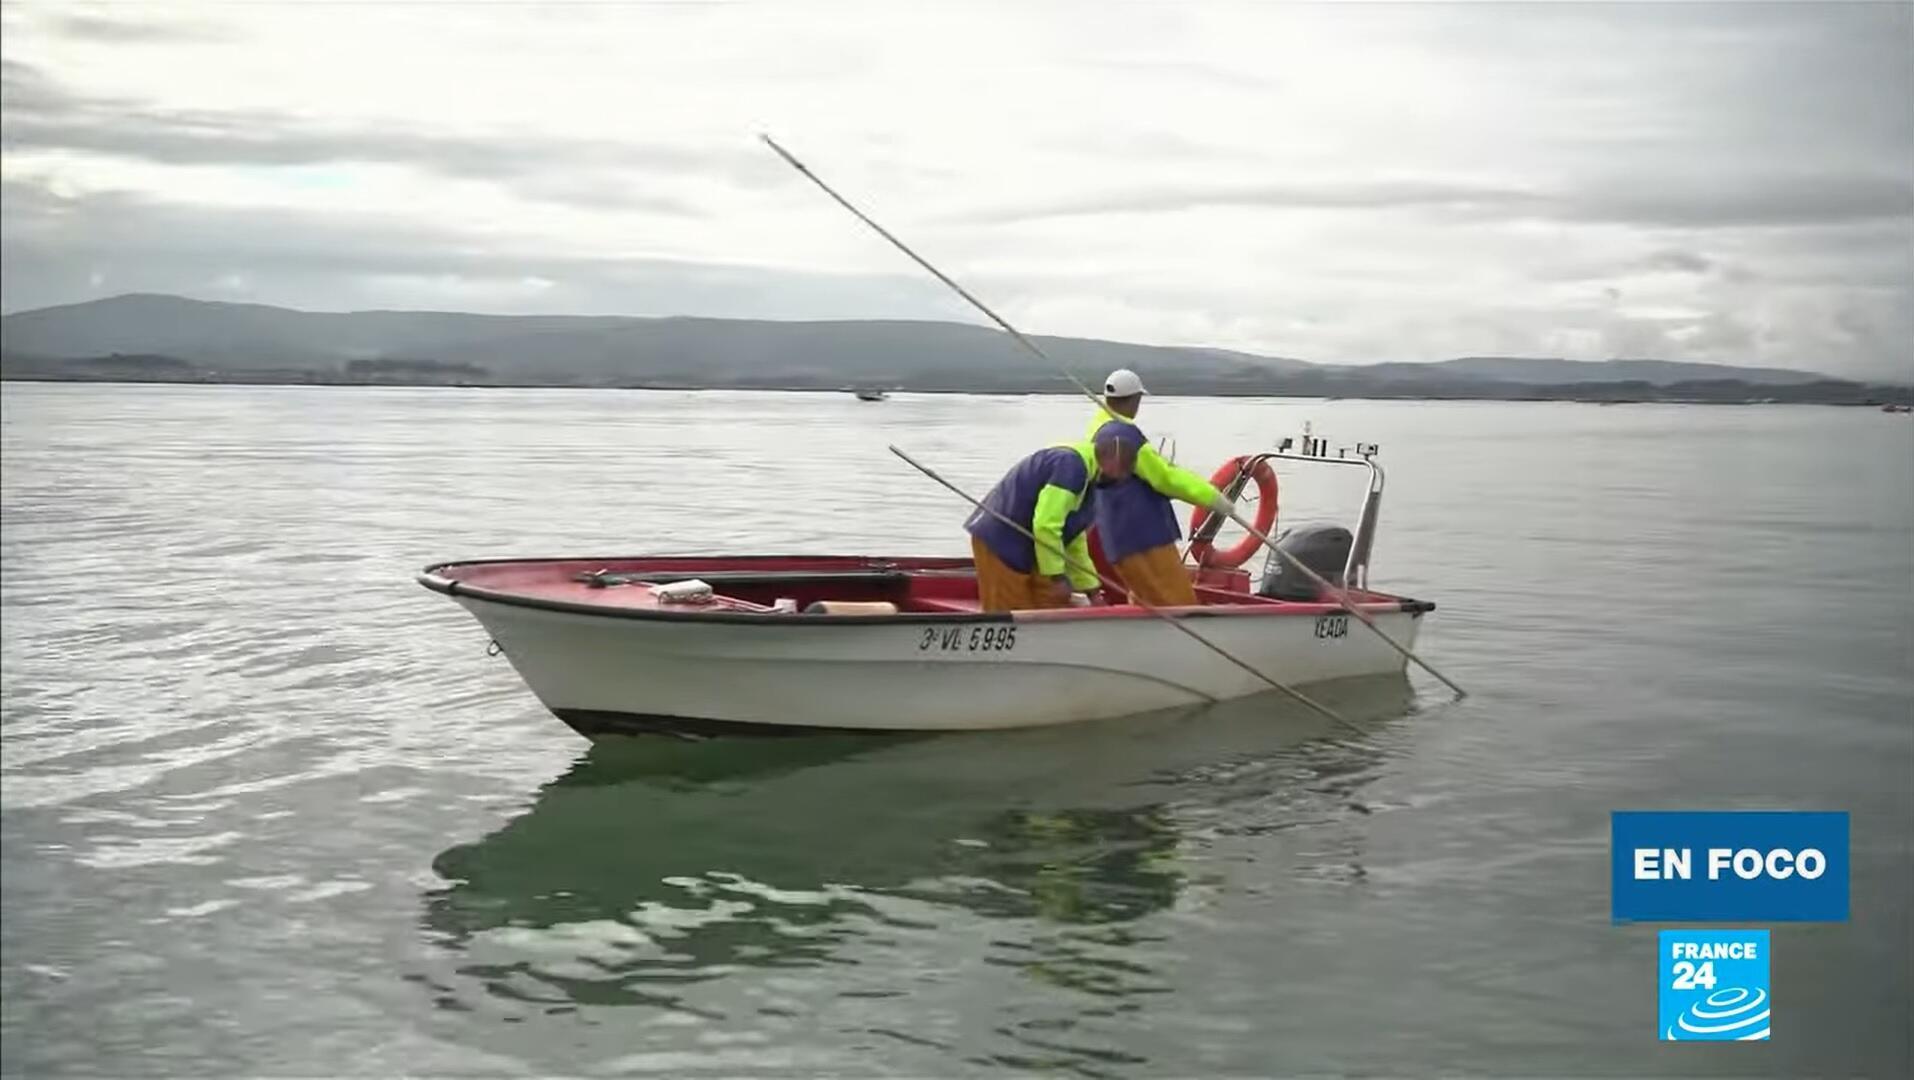 En Foco Pescadores Galicia